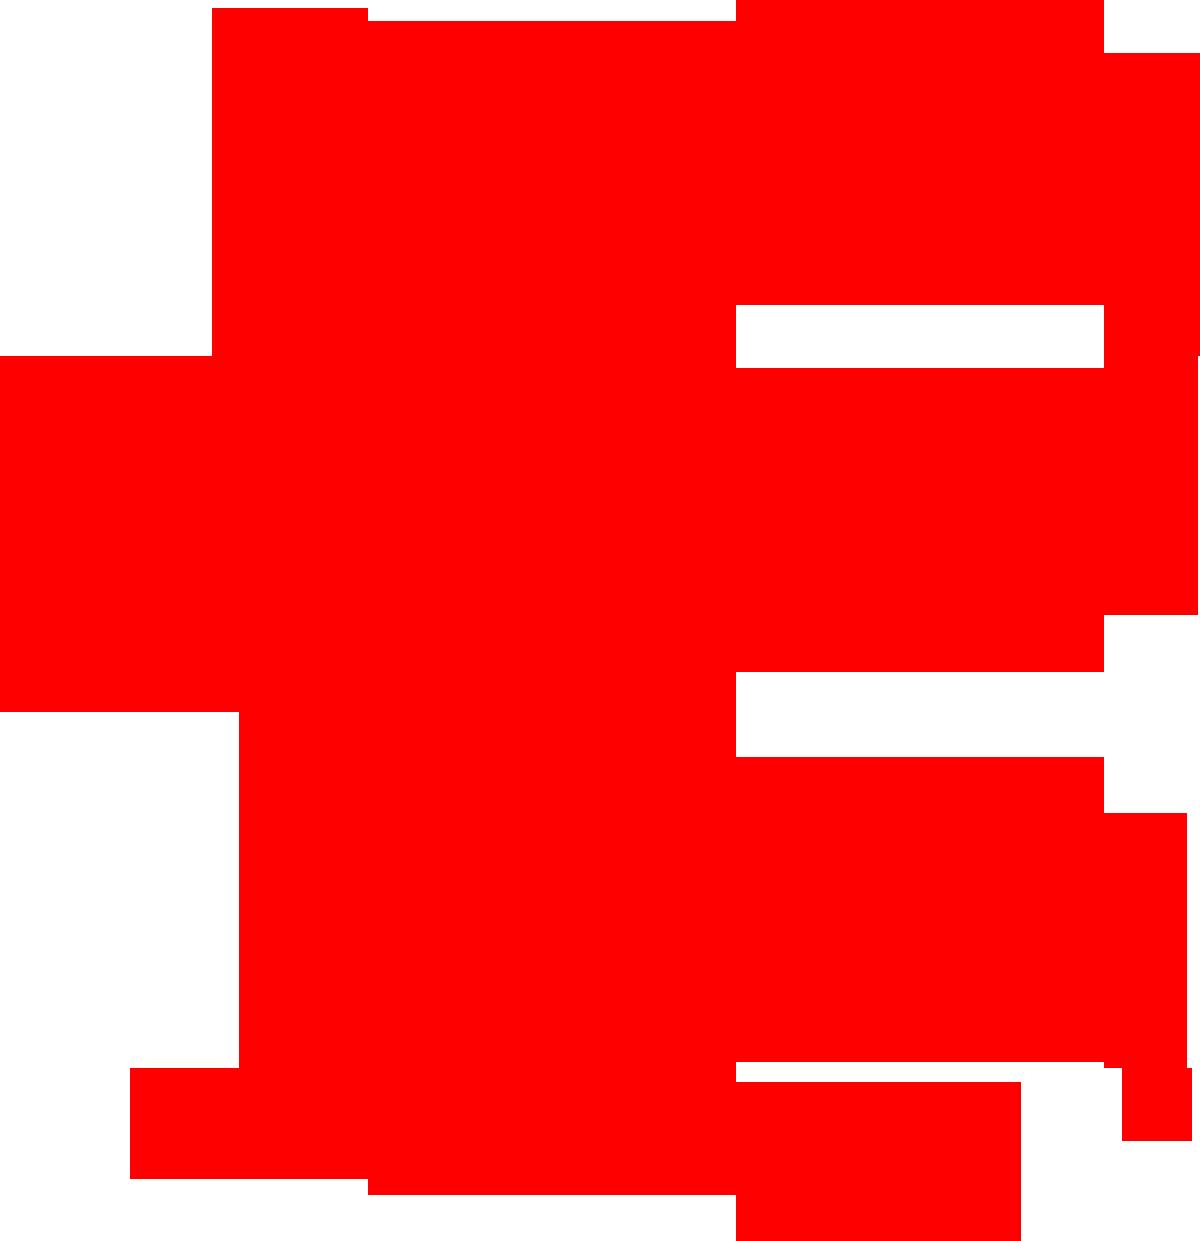 Hearts clipart mini heart God Free Border collection Clipart